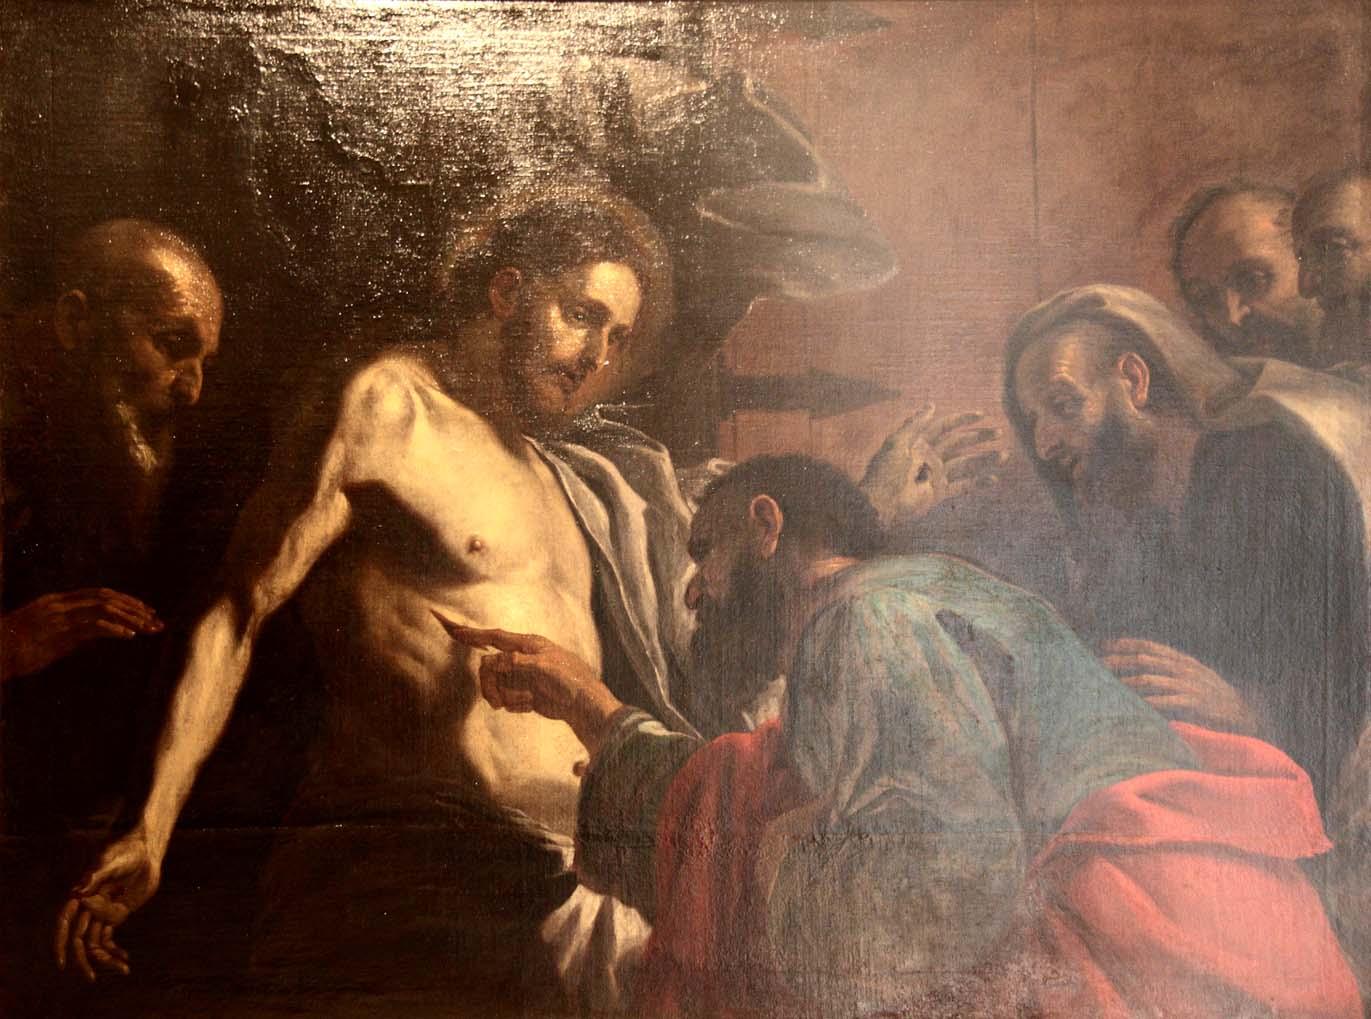 FileIncredulity of St Thomas Preti 24042008jpg FileIncredulity of St Thomas Preti 24042008jpg Wikimedia Commons